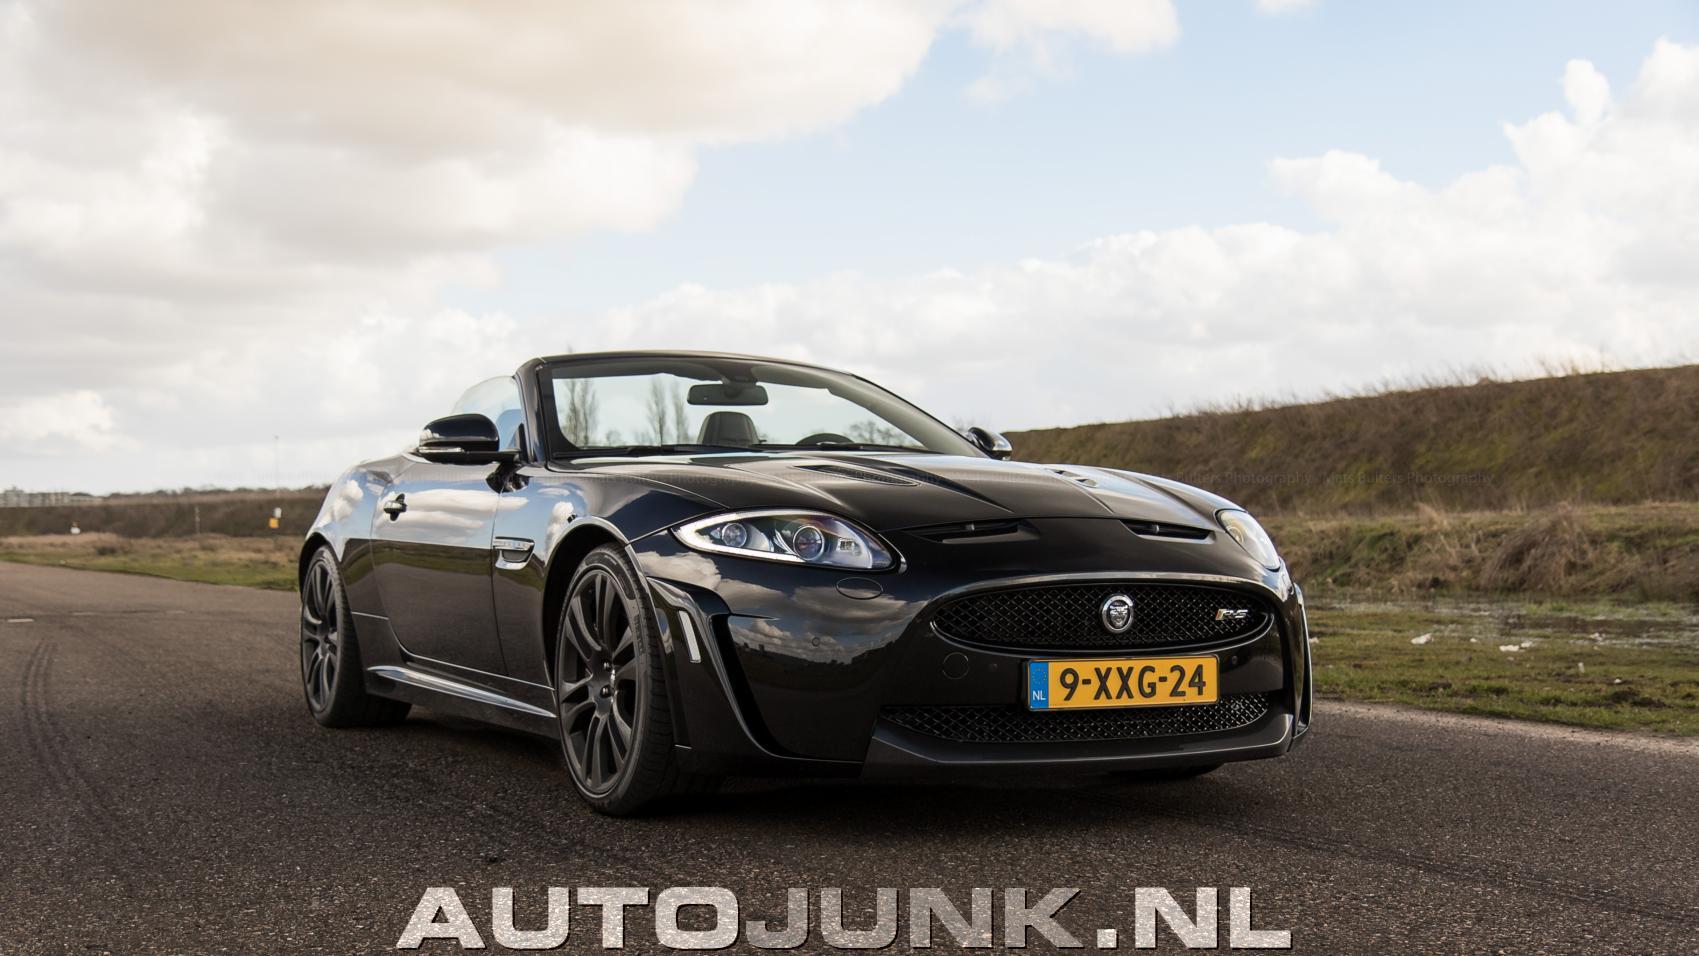 Jaguar XK-RS cabrio foto's » Autojunk.nl (135700)